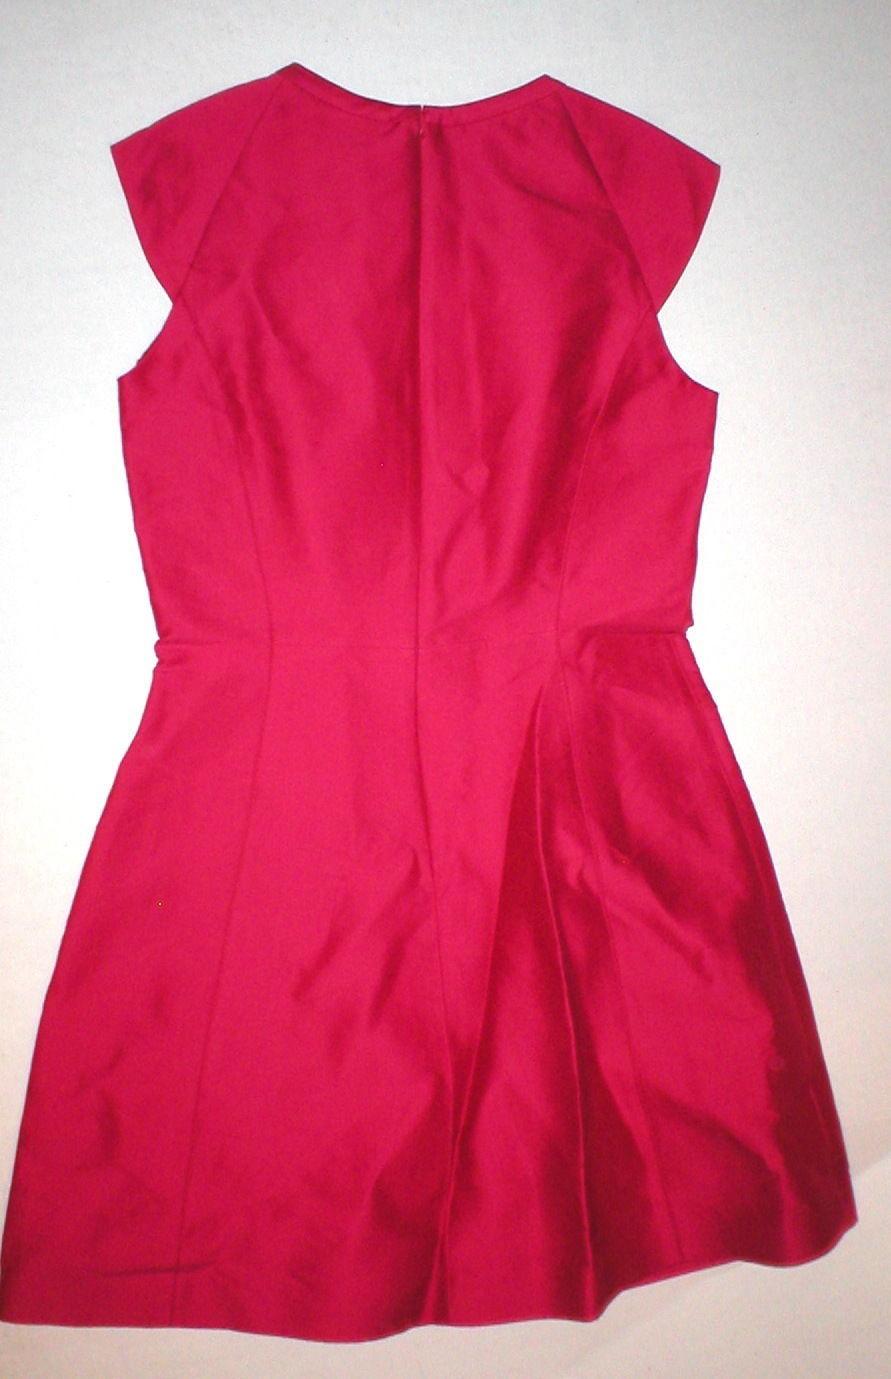 New $495 Womens Halston Heritage 6 Dress Designer Dark Pink NWT Cut Out Neck image 7